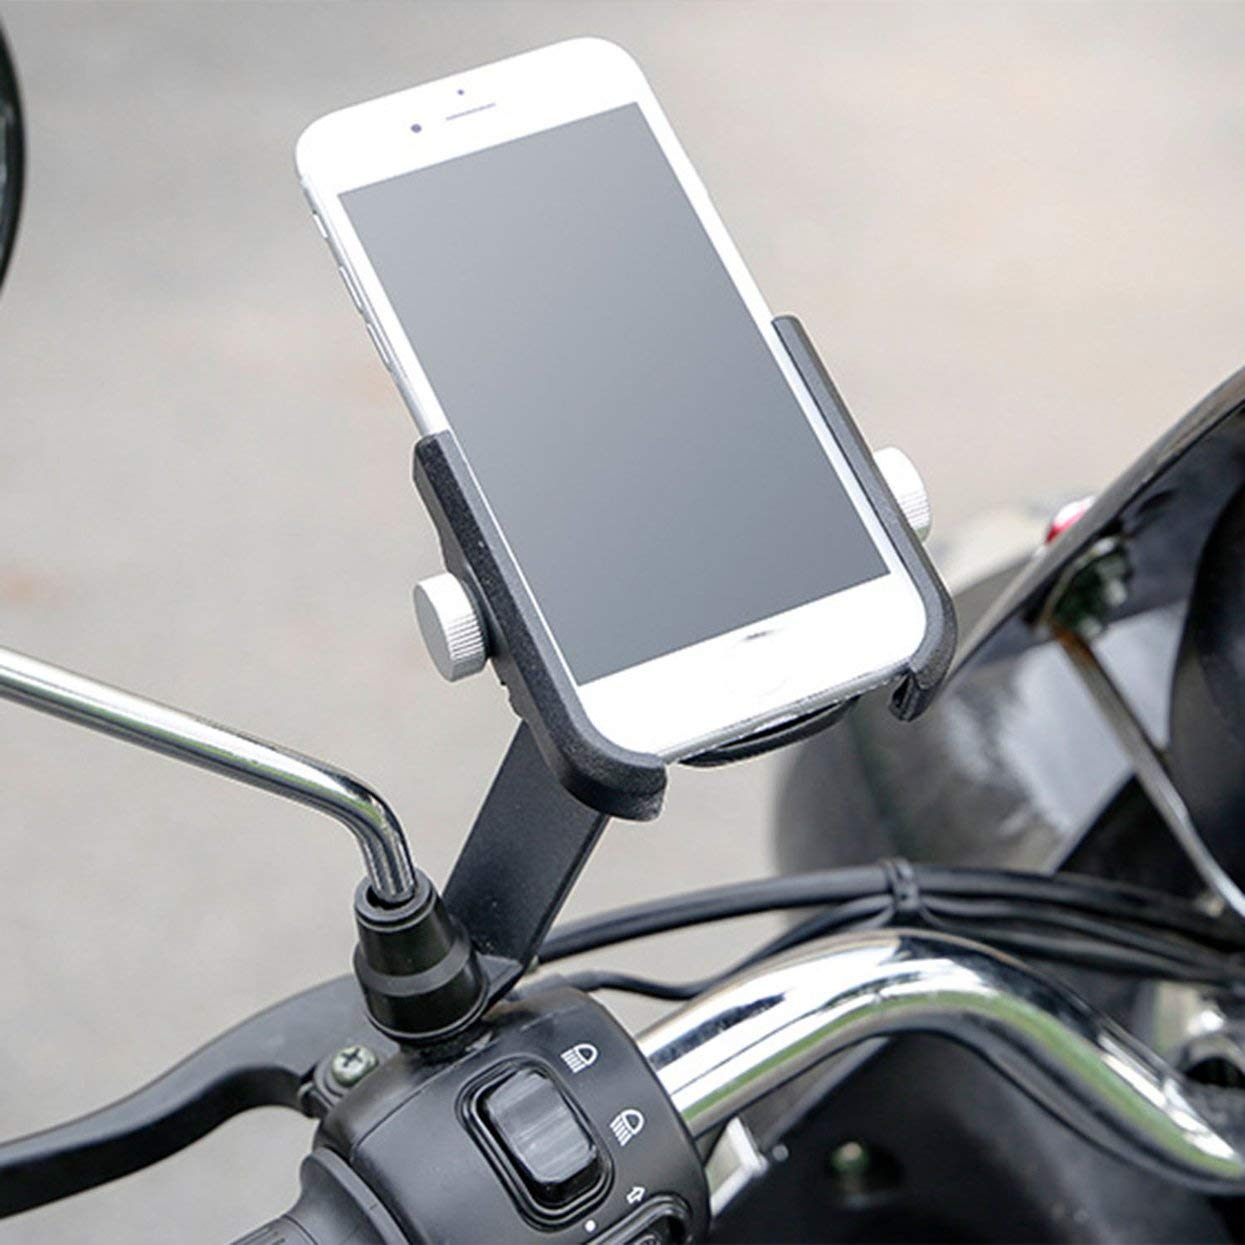 Aluminum Alloy Bike Motorcycle Handlebar Mount Phone Holder 360 Degree Rotating Universal Phone Holder Clip